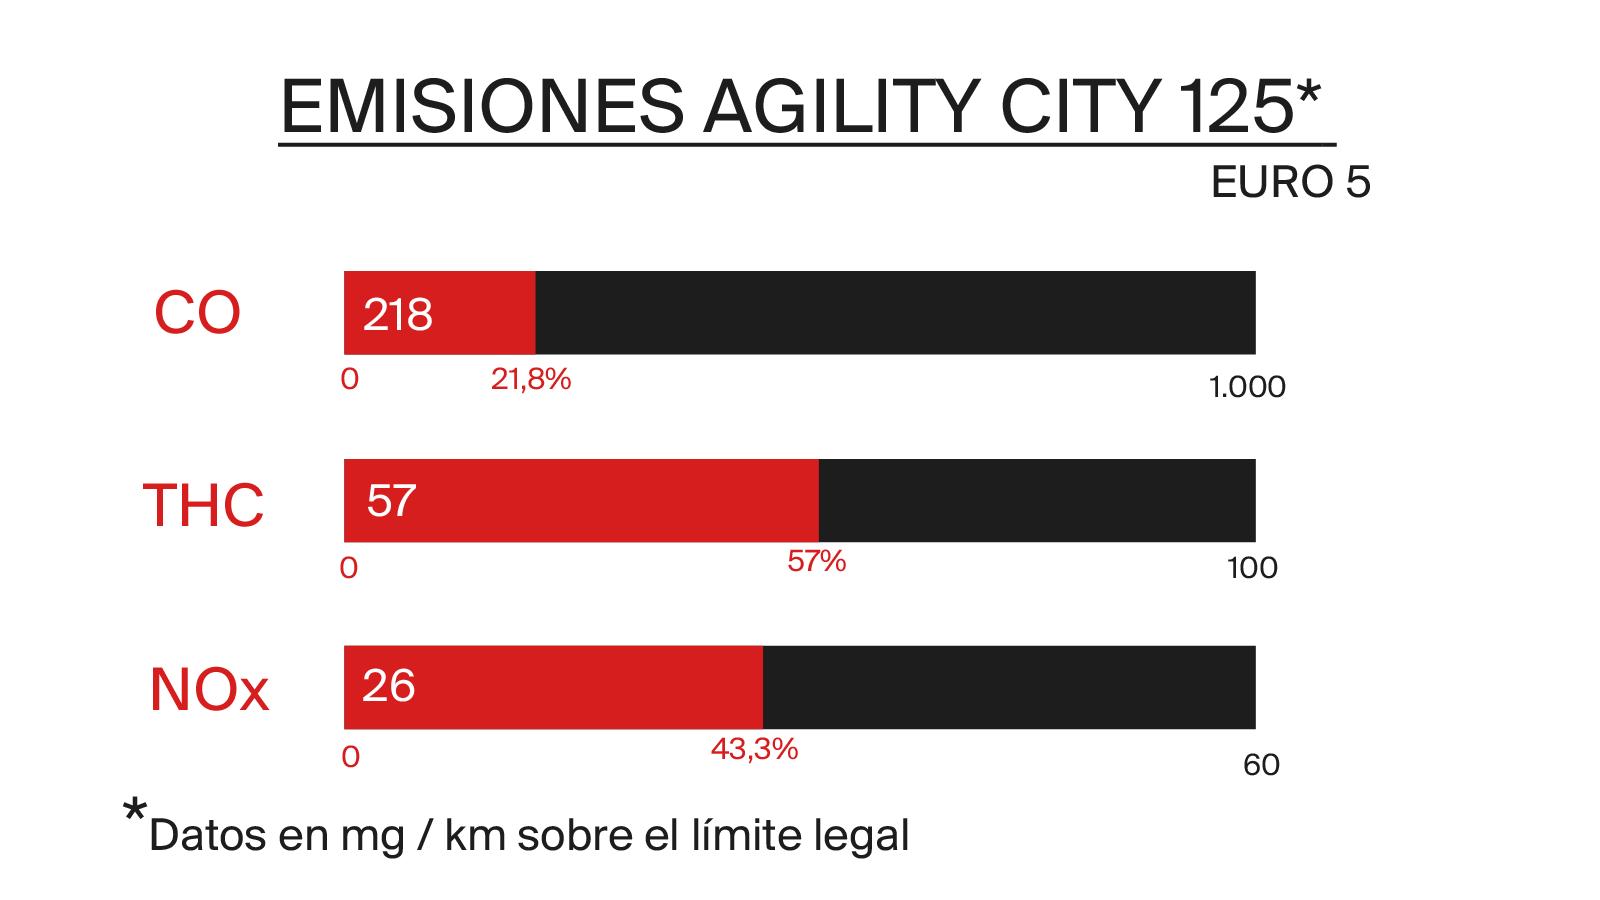 emisiones euro 5 moto agility city 125